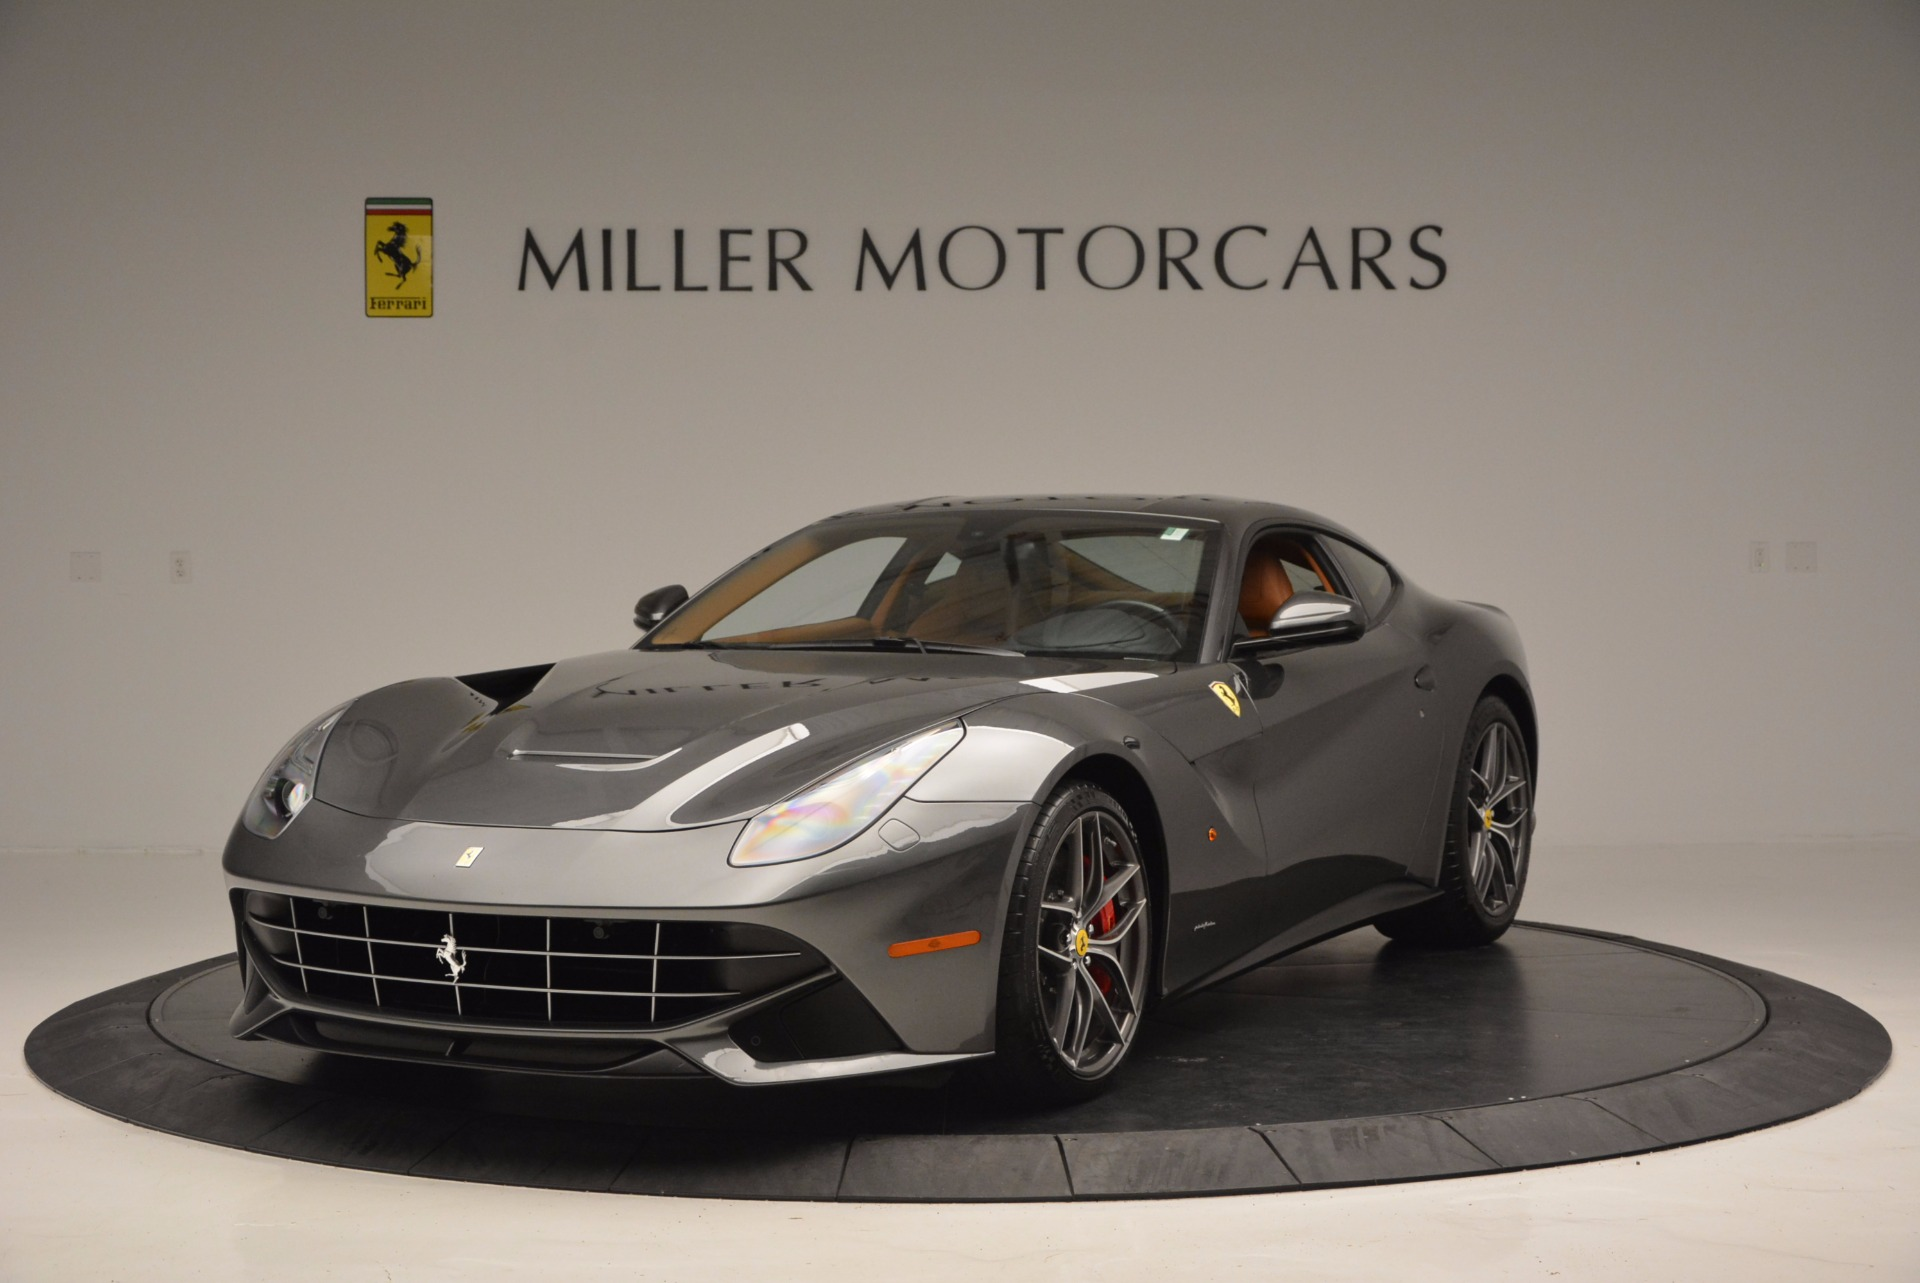 Used 2014 Ferrari F12 Berlinetta for sale Sold at Maserati of Greenwich in Greenwich CT 06830 1